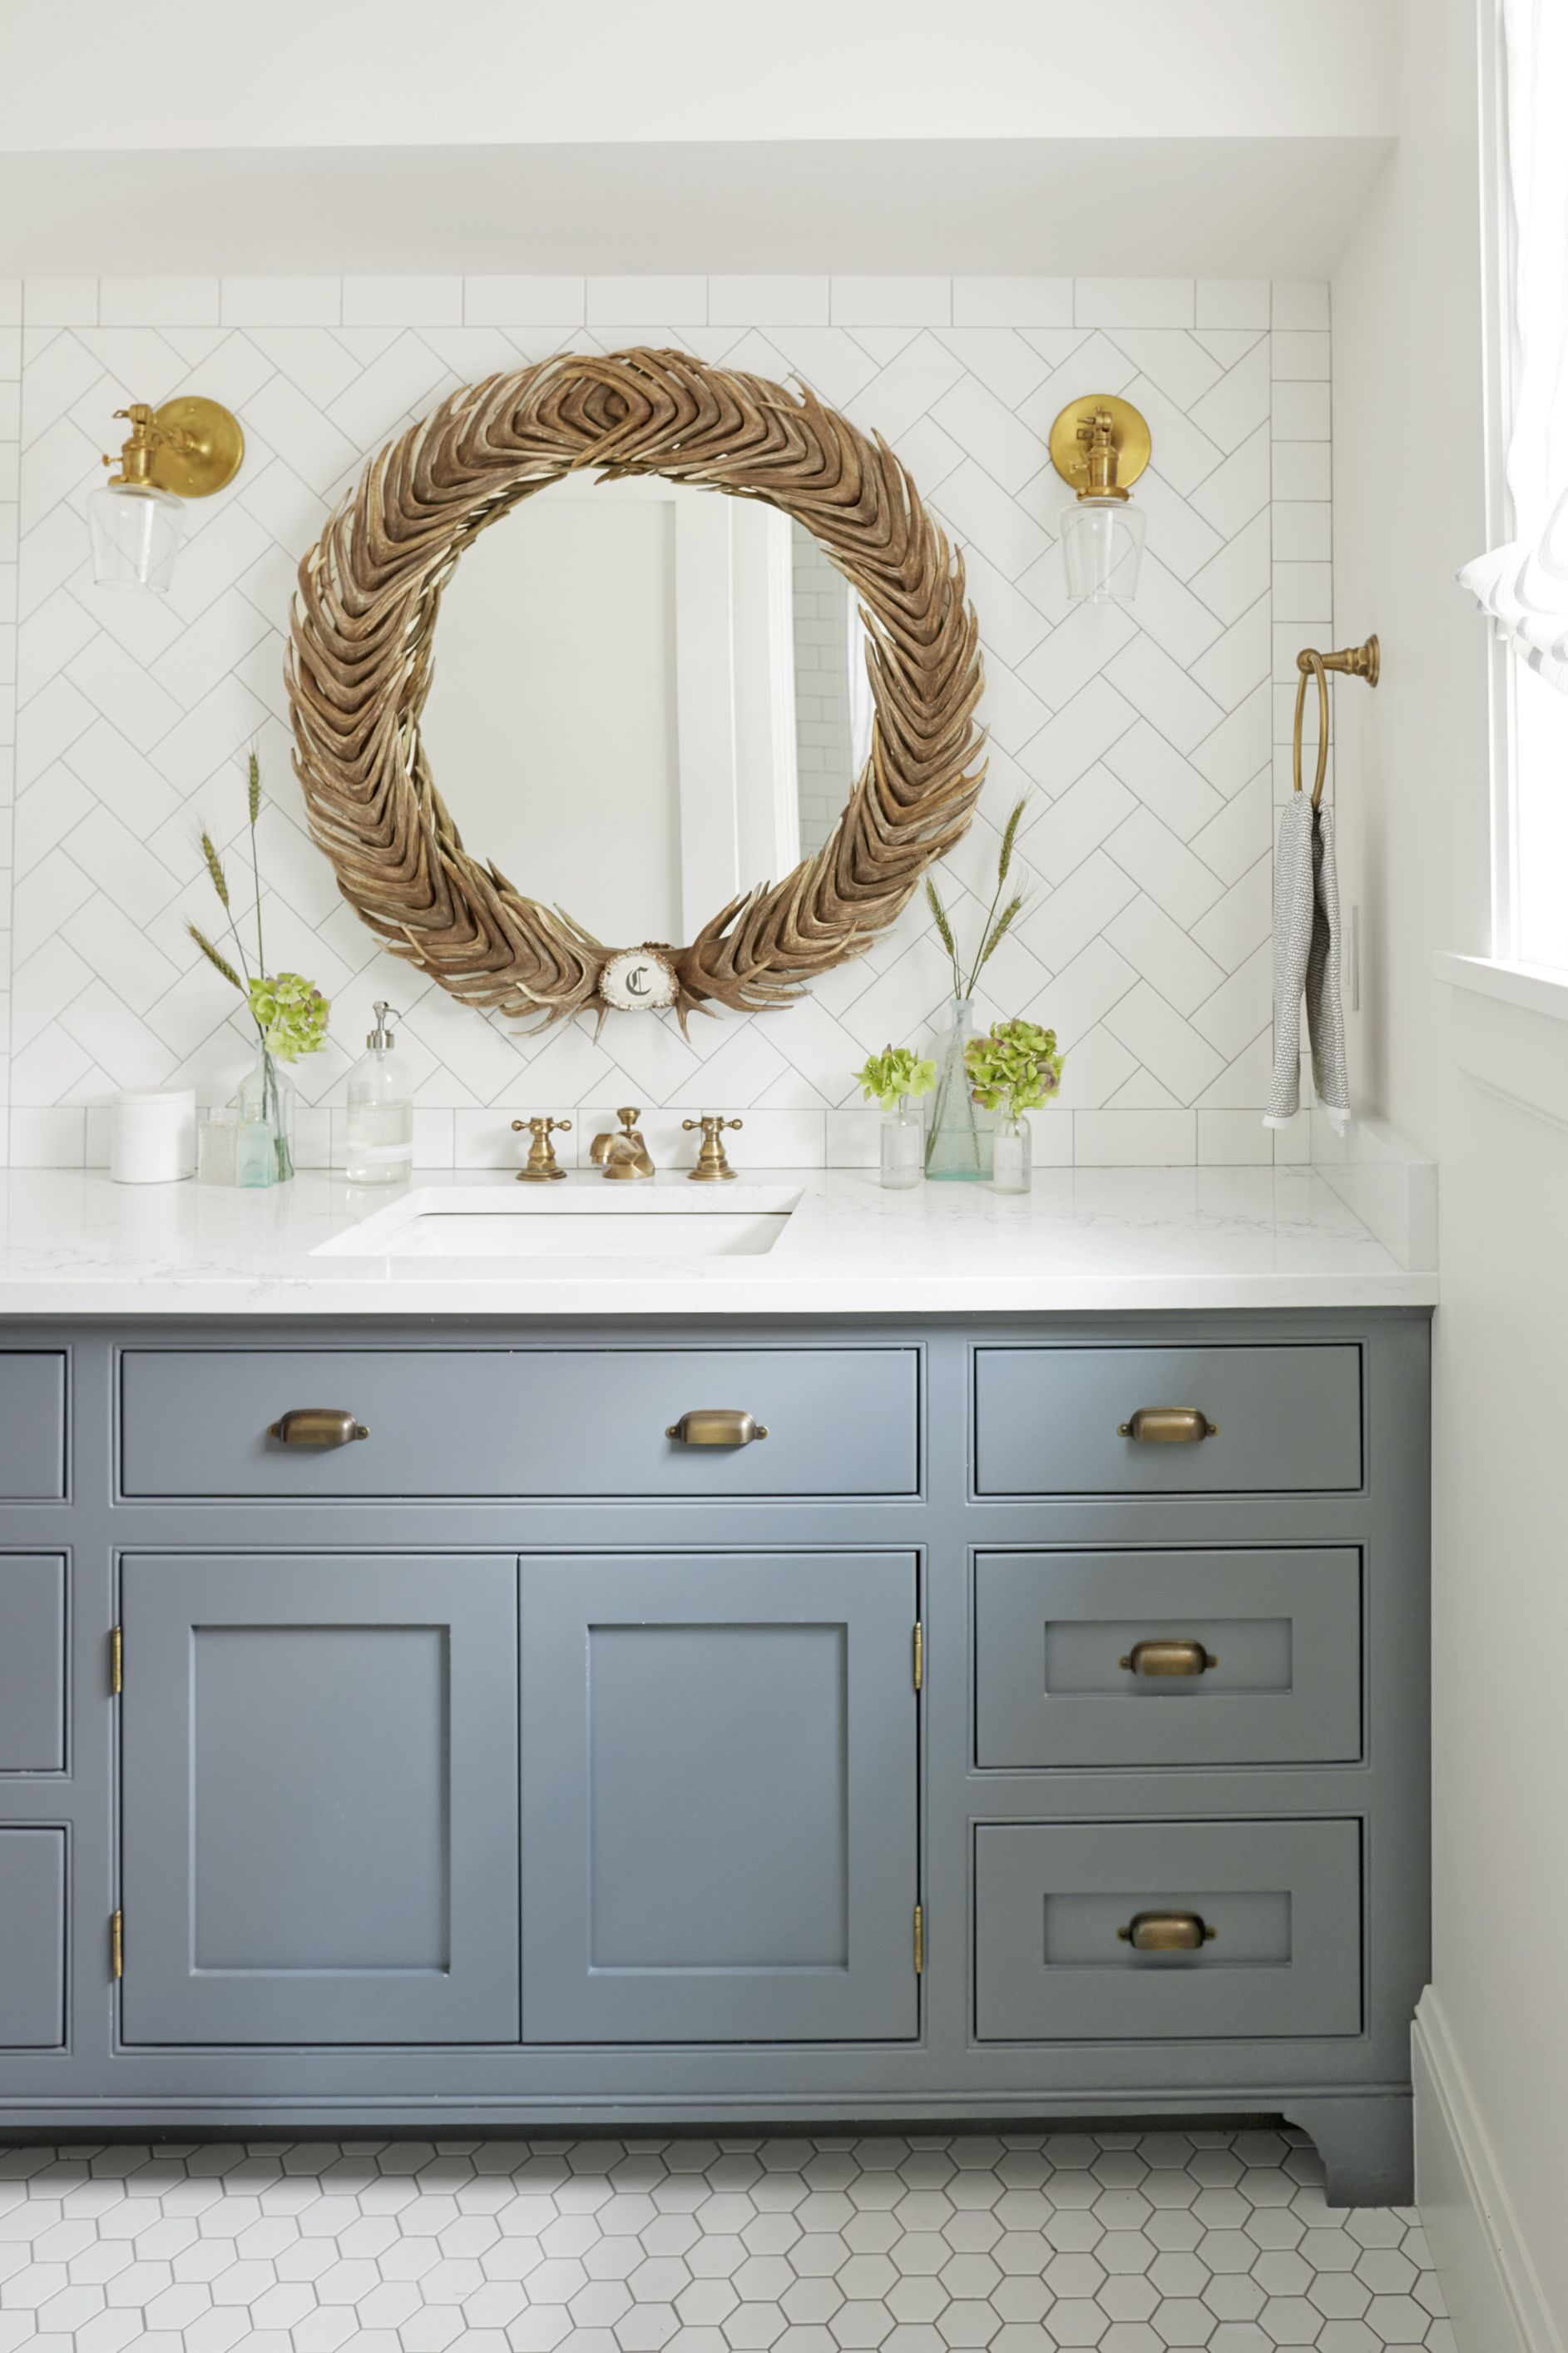 dusty blue bathroom paint color & 20 Best Bathroom Paint Colors - Popular Ideas for Bathroom Wall Colors